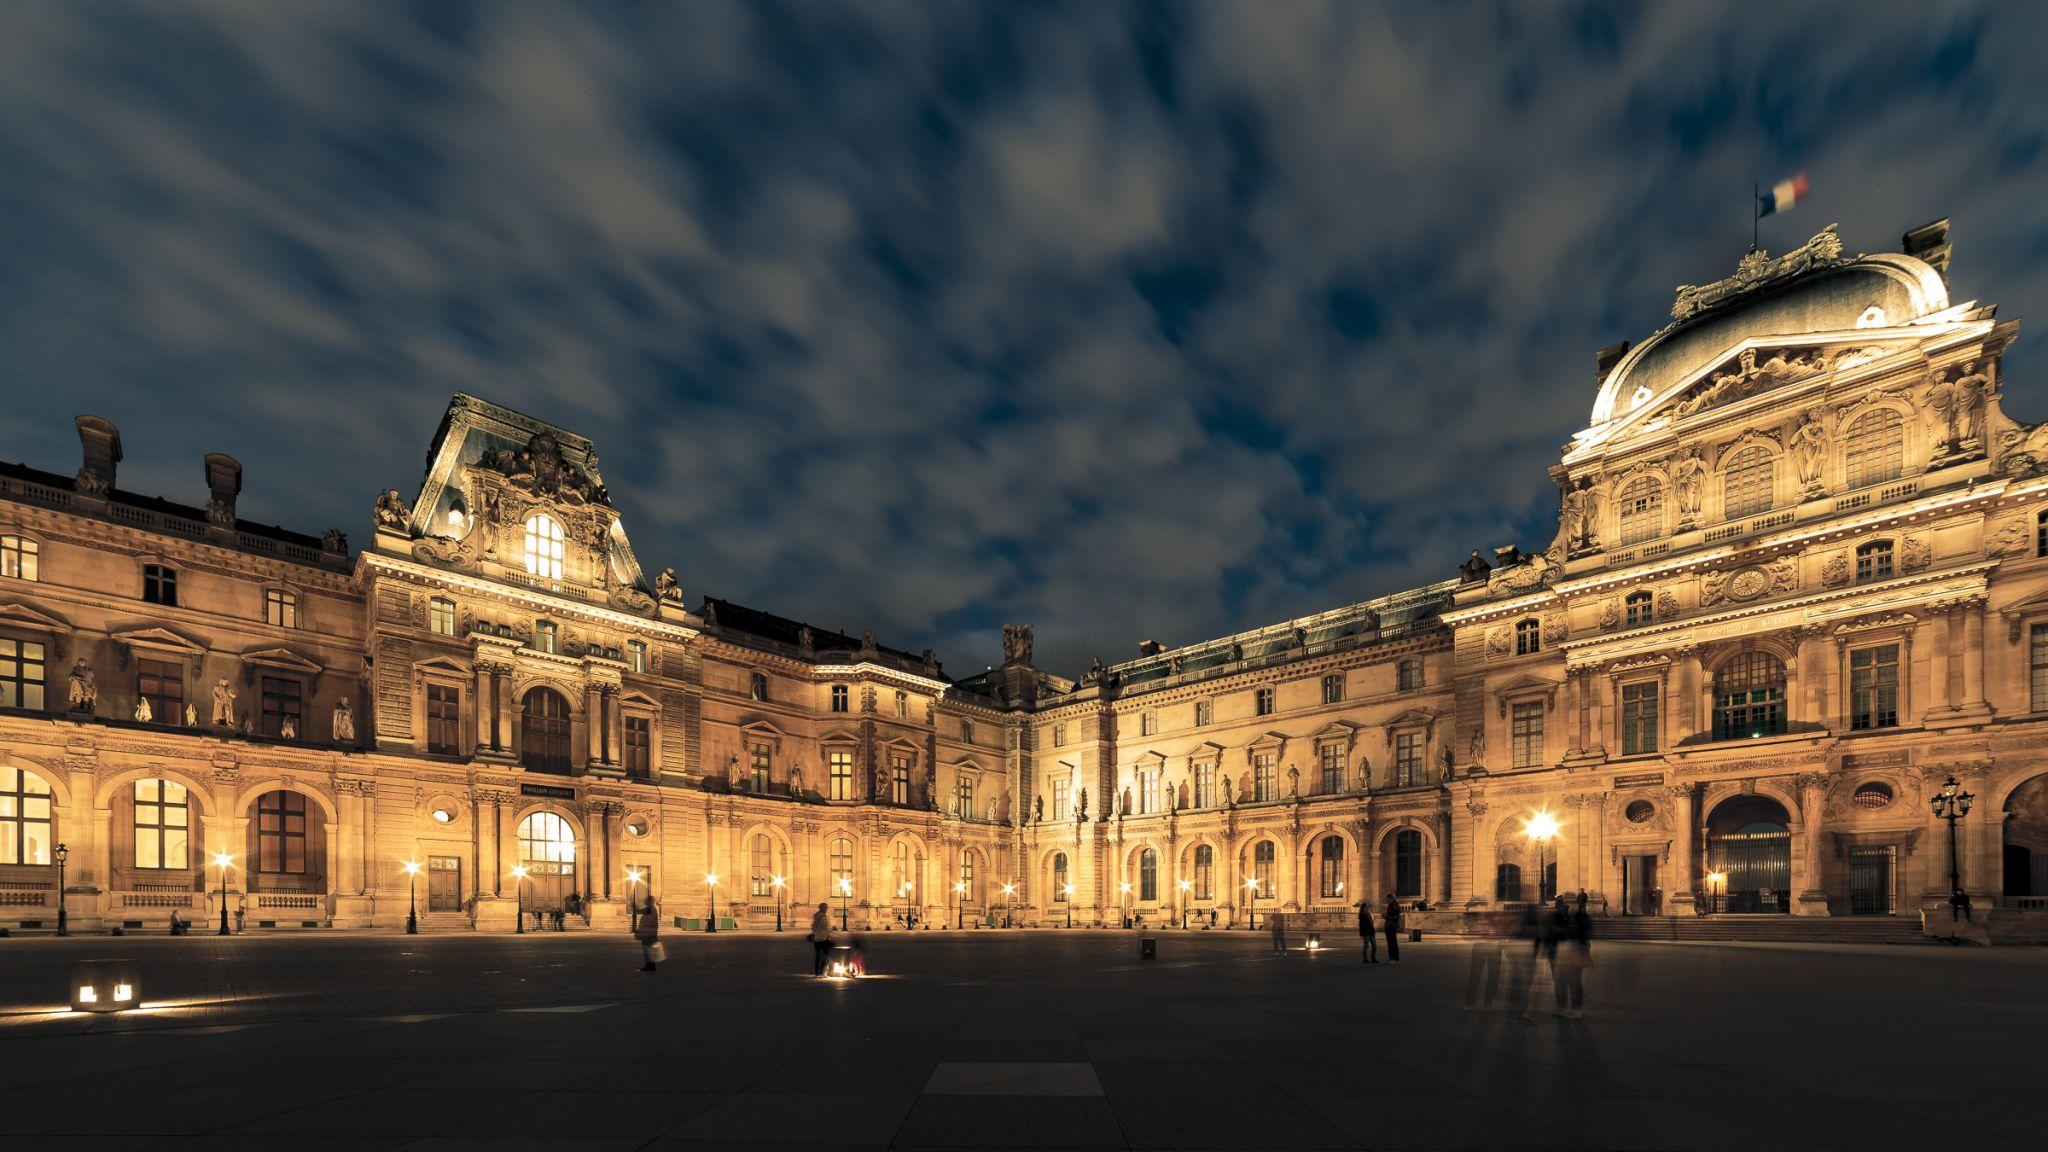 Otherside, Louvre, France